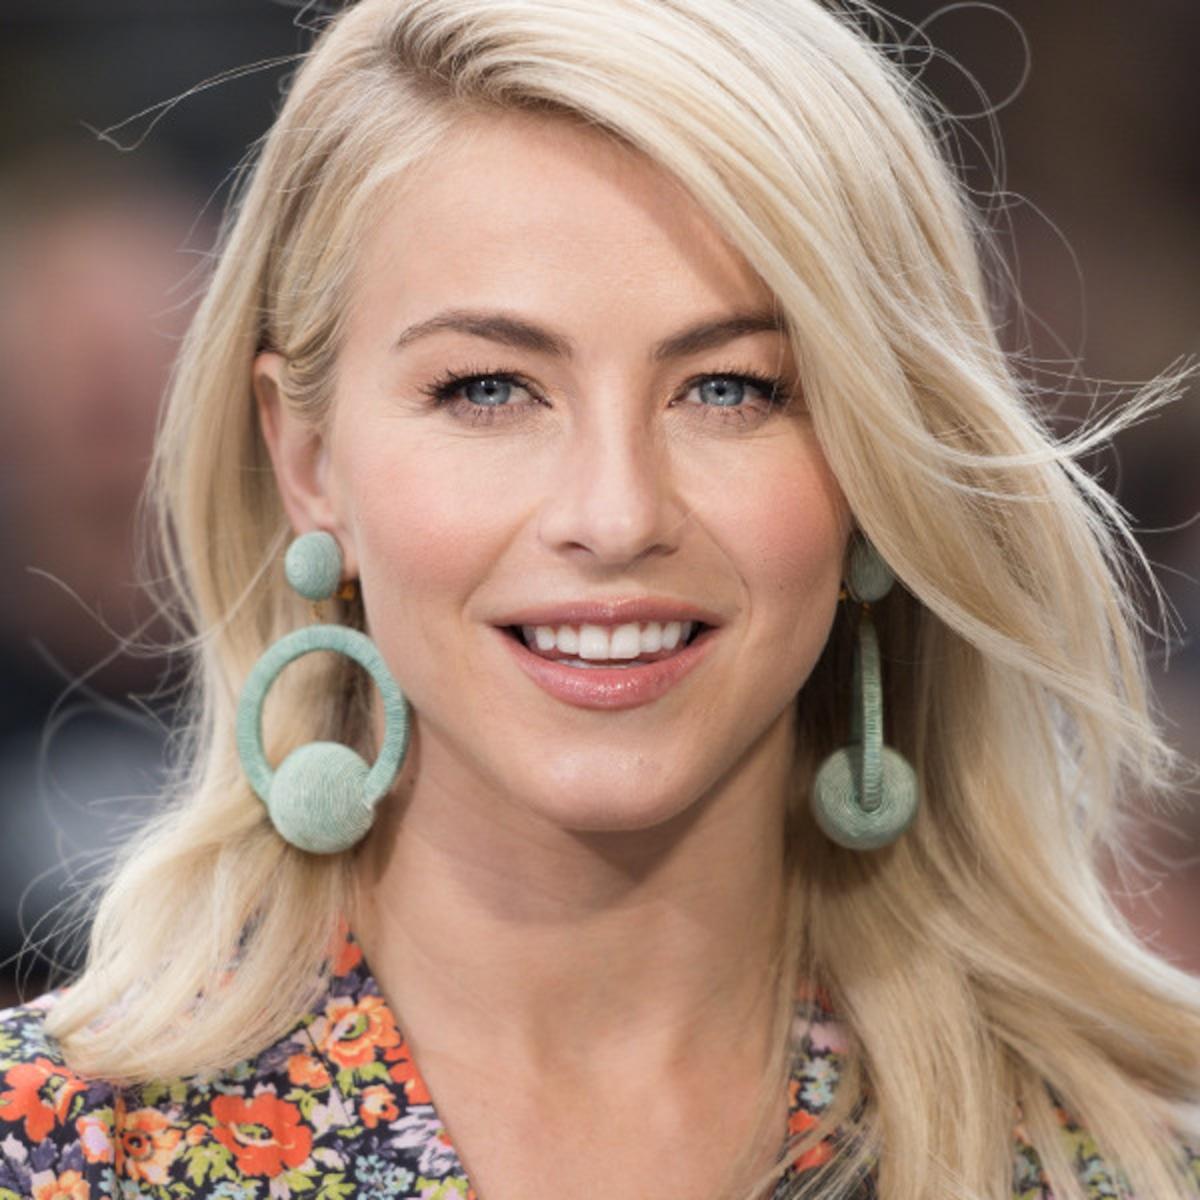 Julianne Hough S Makeup Artist Reveals How To Make Your Eyes Pop E Online